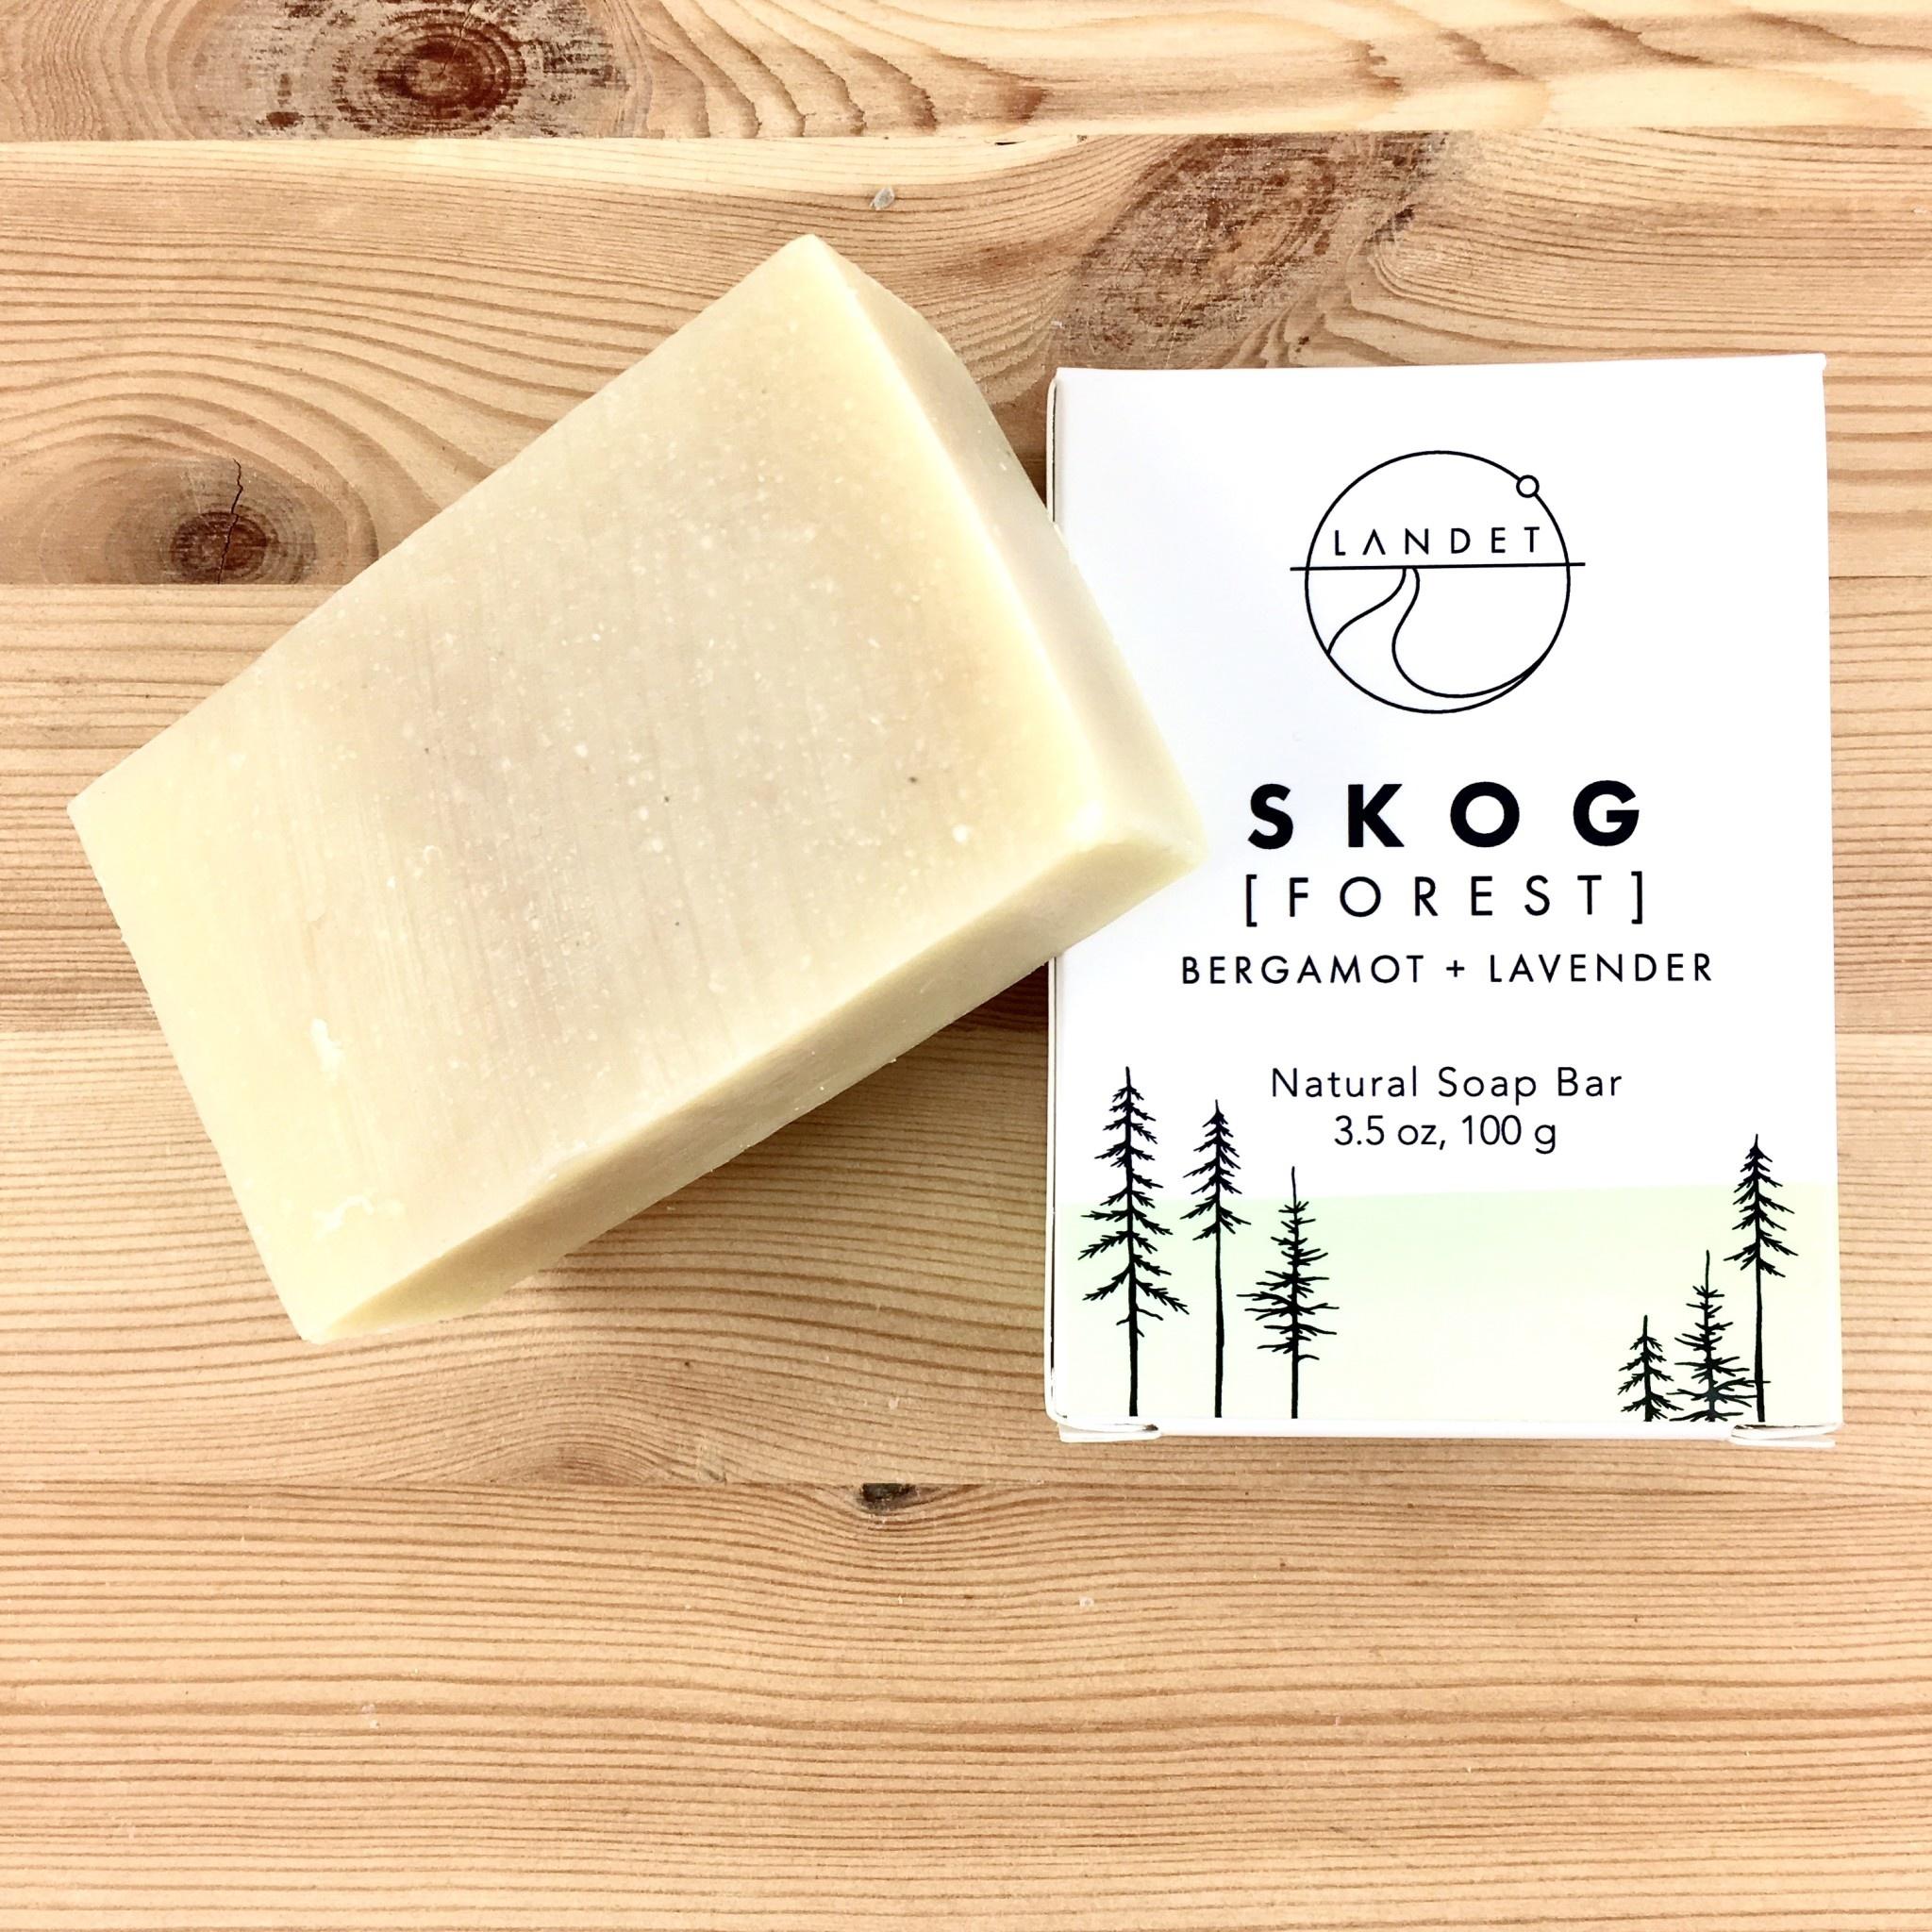 Landet Studio / KoenigCo. / Sunshine Raindrop Forest (Skog): Bergamot Lavender Bar Soap